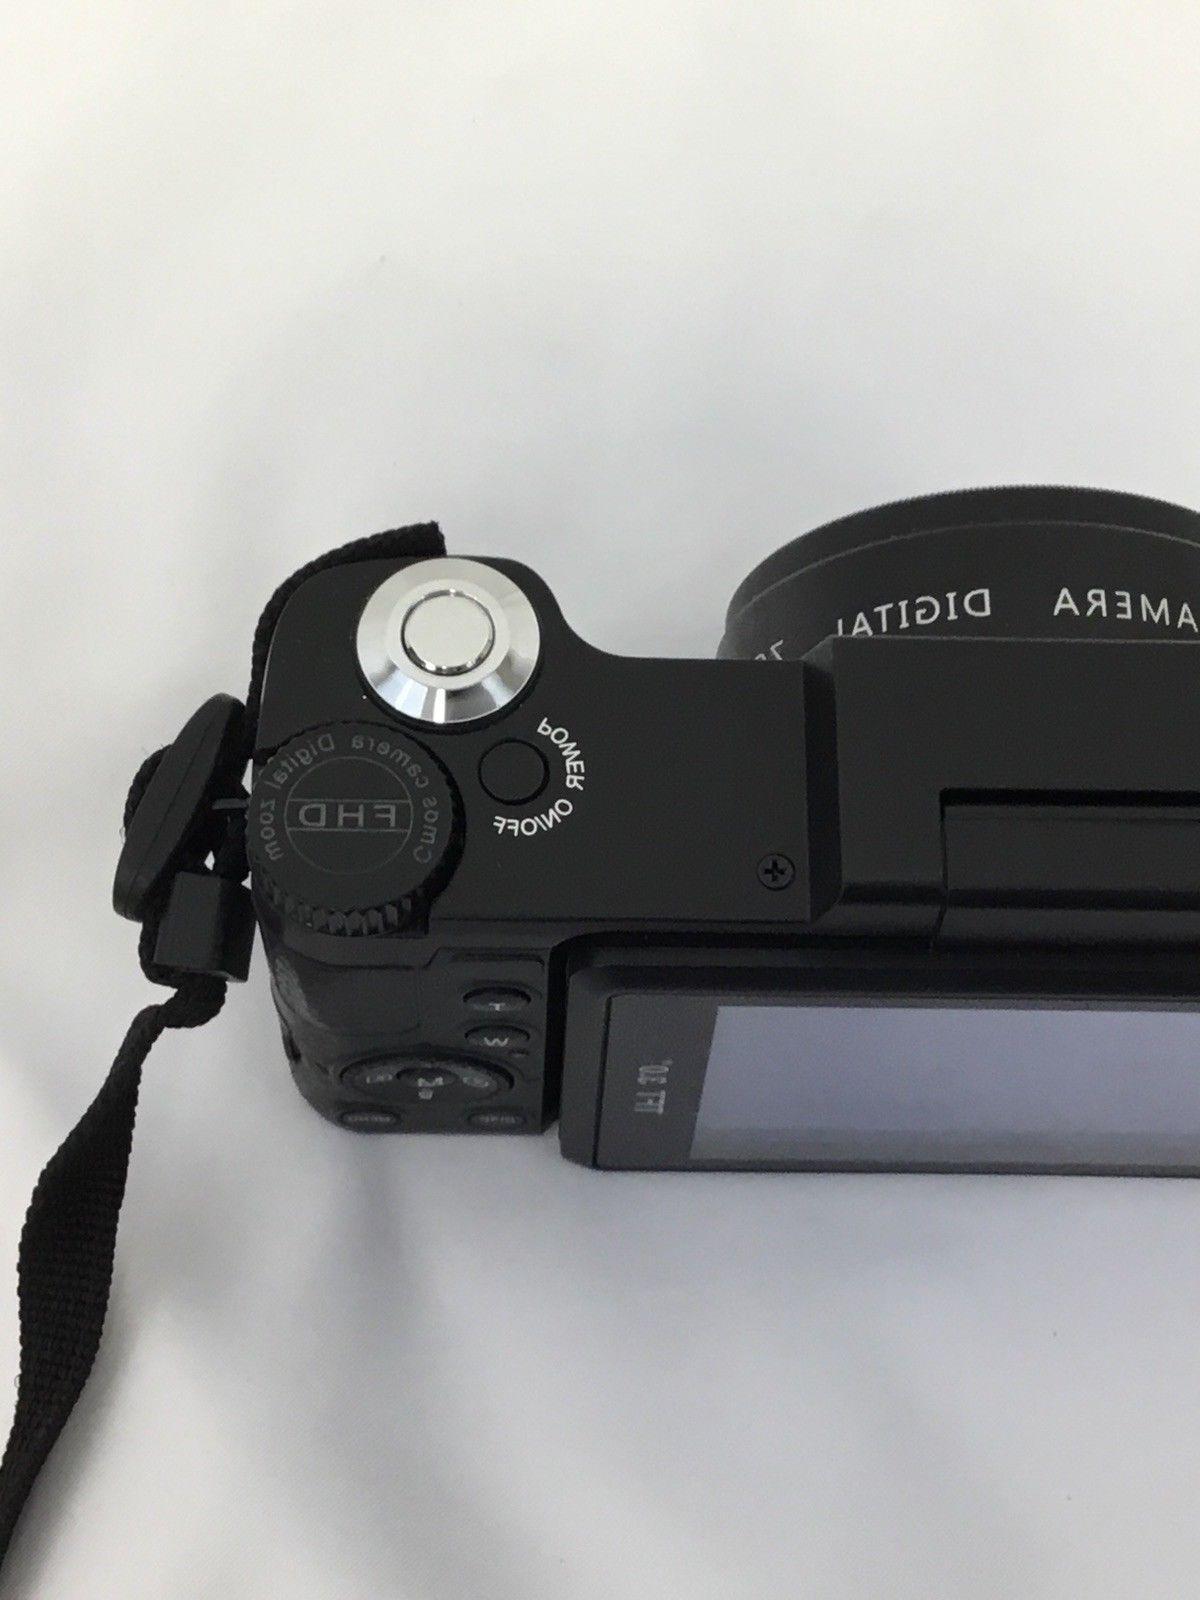 SEREE Camcorder Full 24.0 4x Zoom